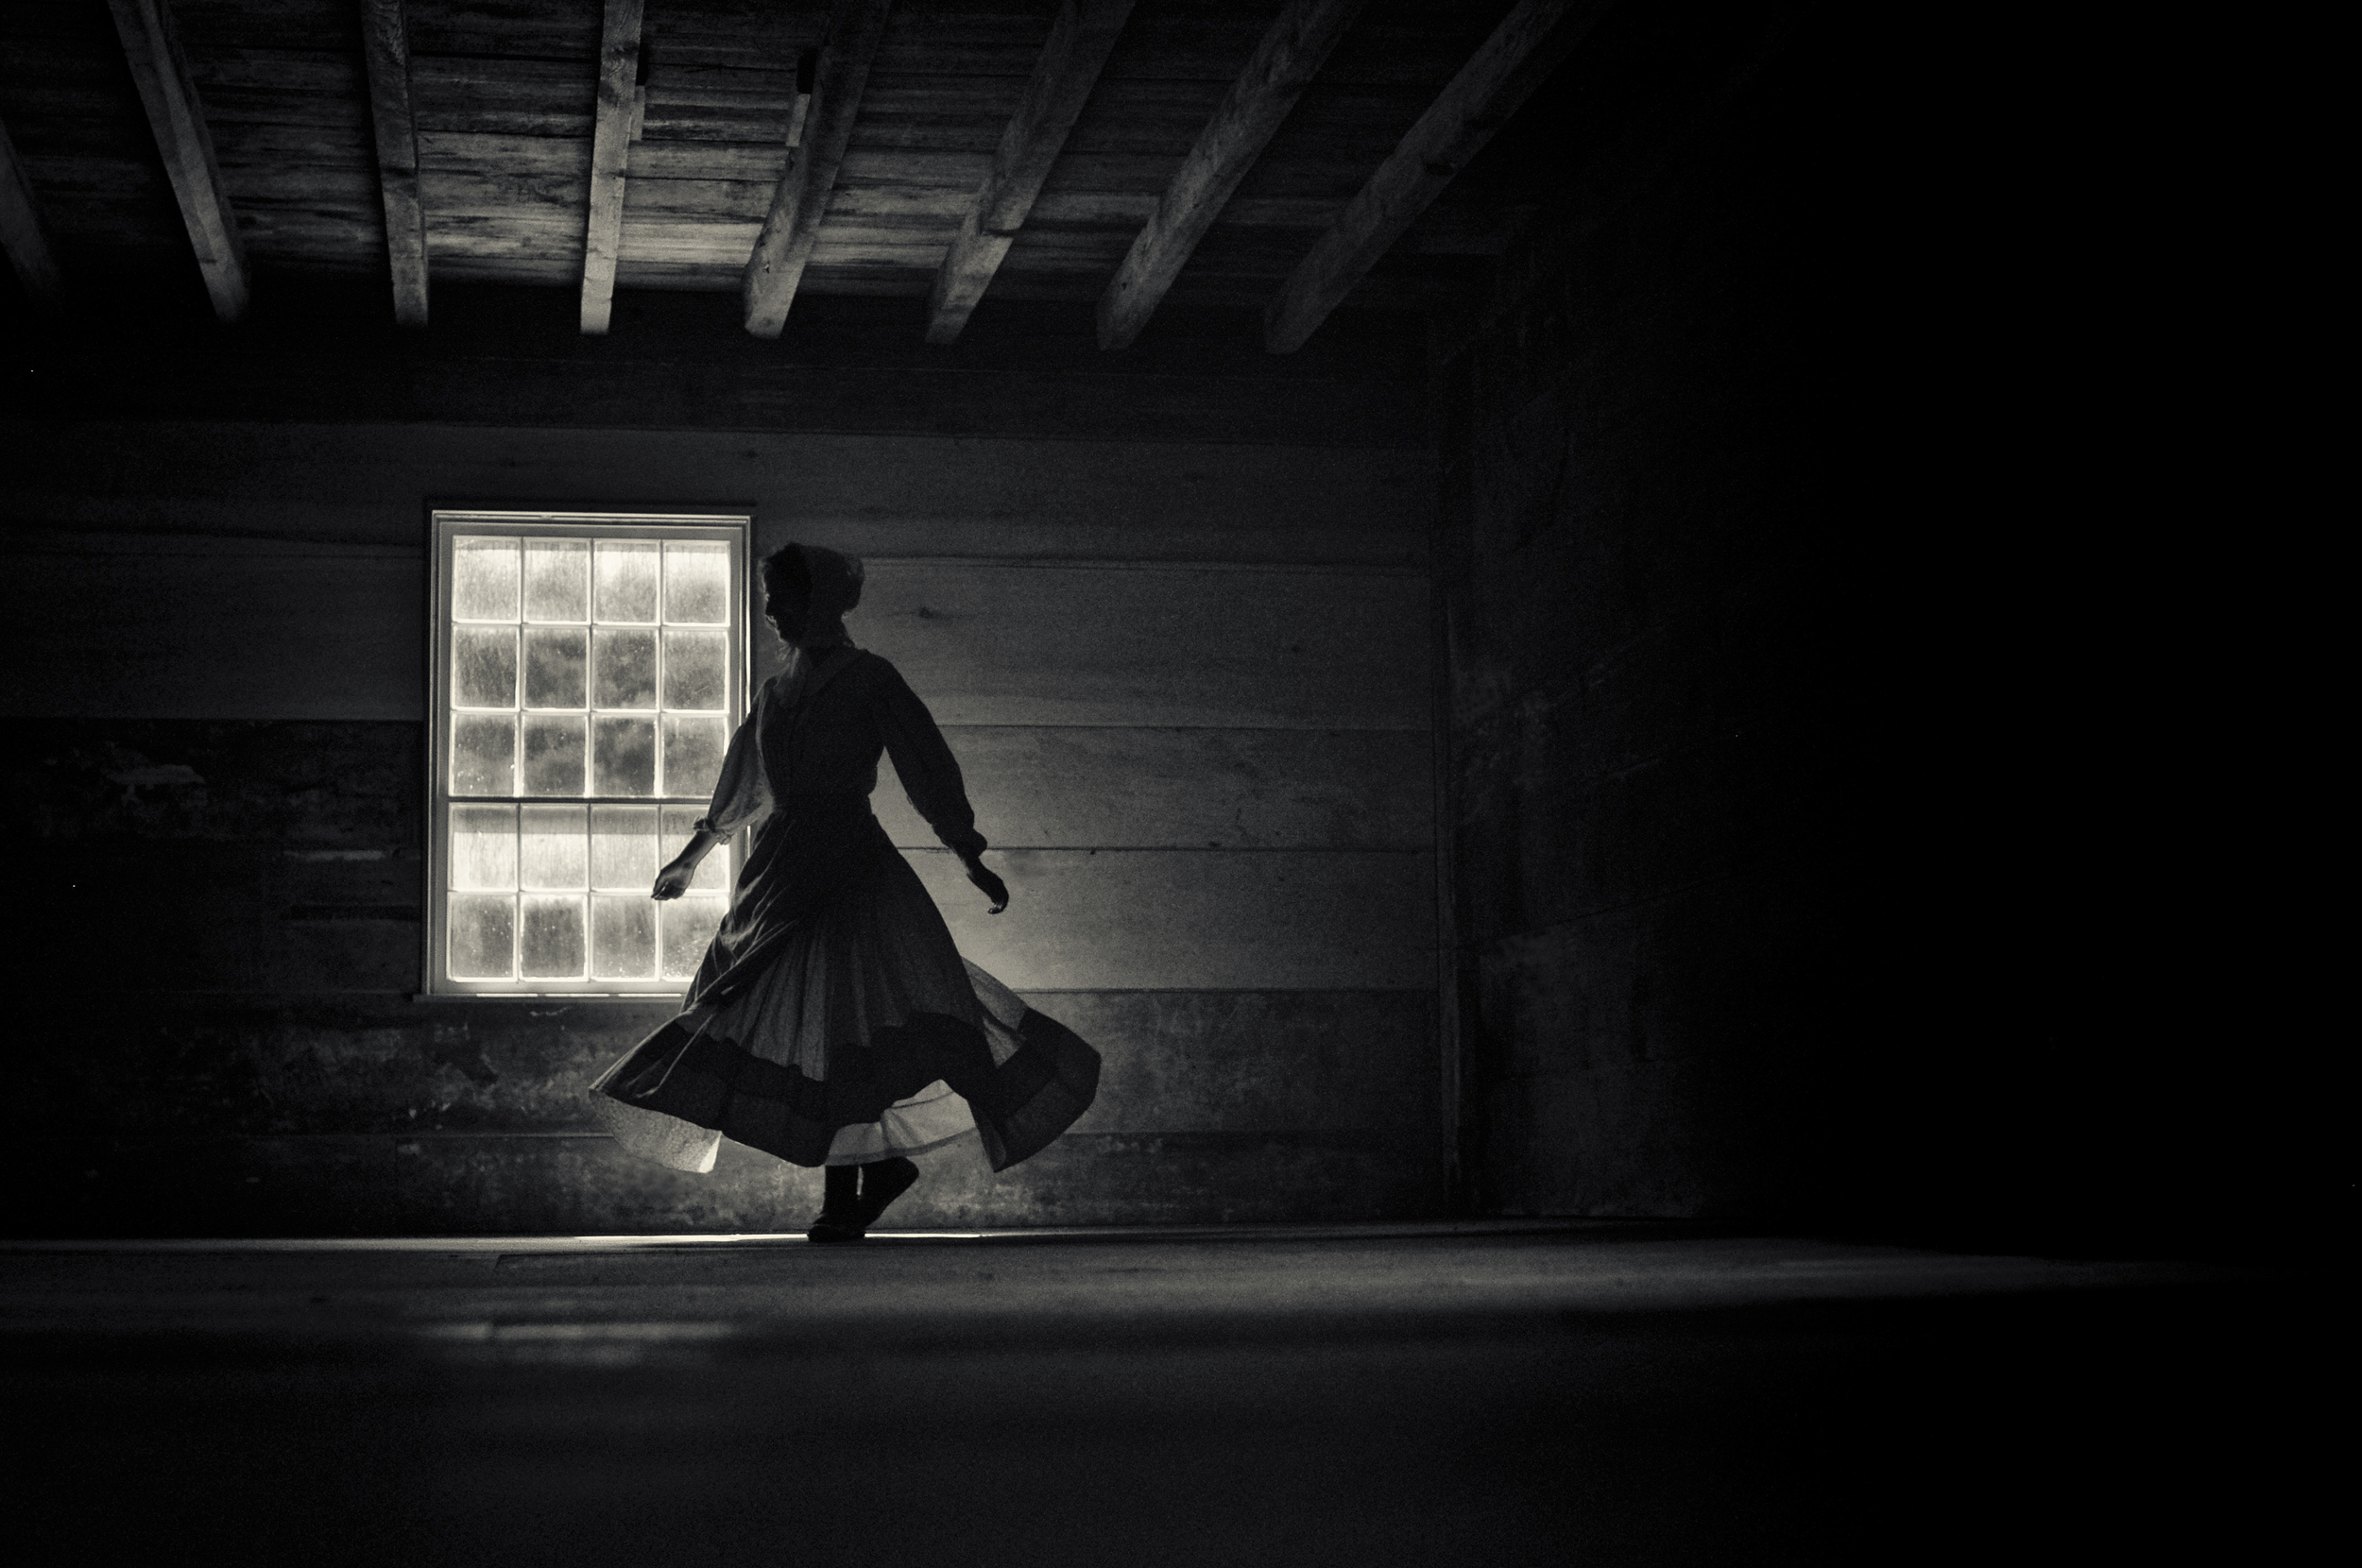 "The Key   ""The key is in the window, the key is in the sunlight at the window..."" –Naomi Ginsberg"